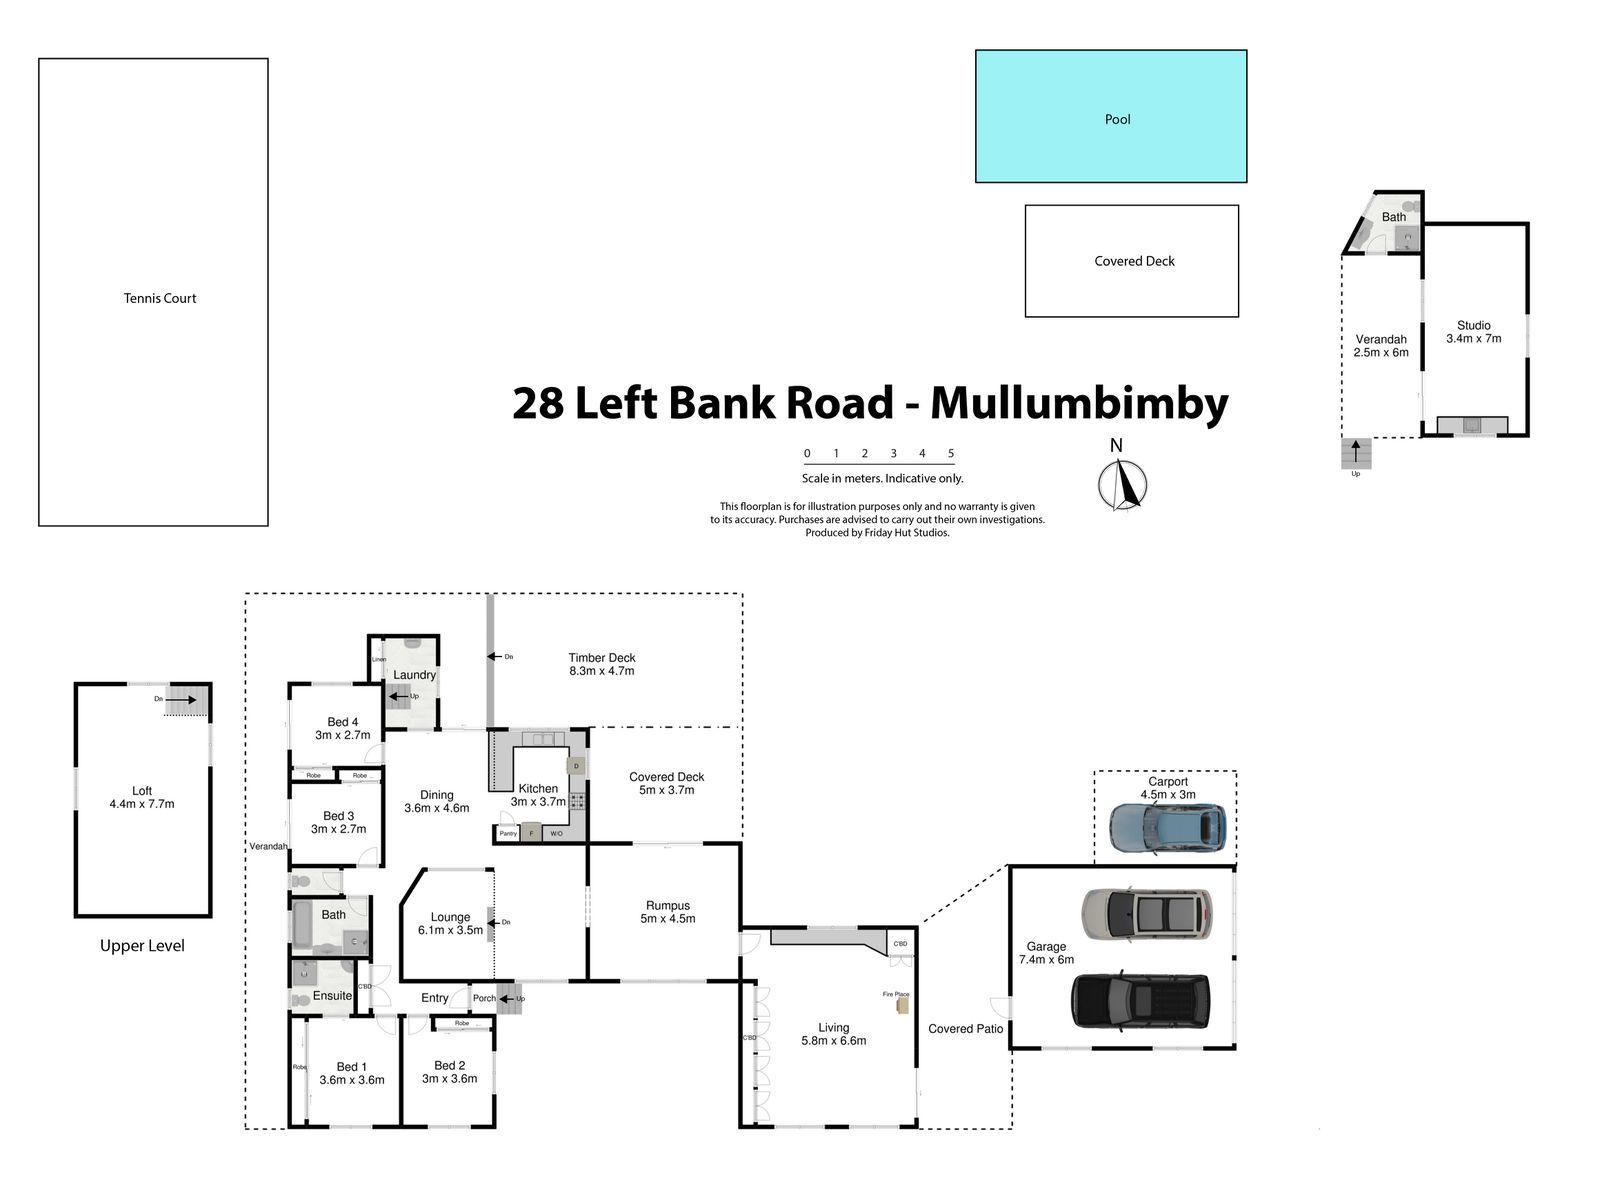 28 Left Bank Road, Mullumbimby